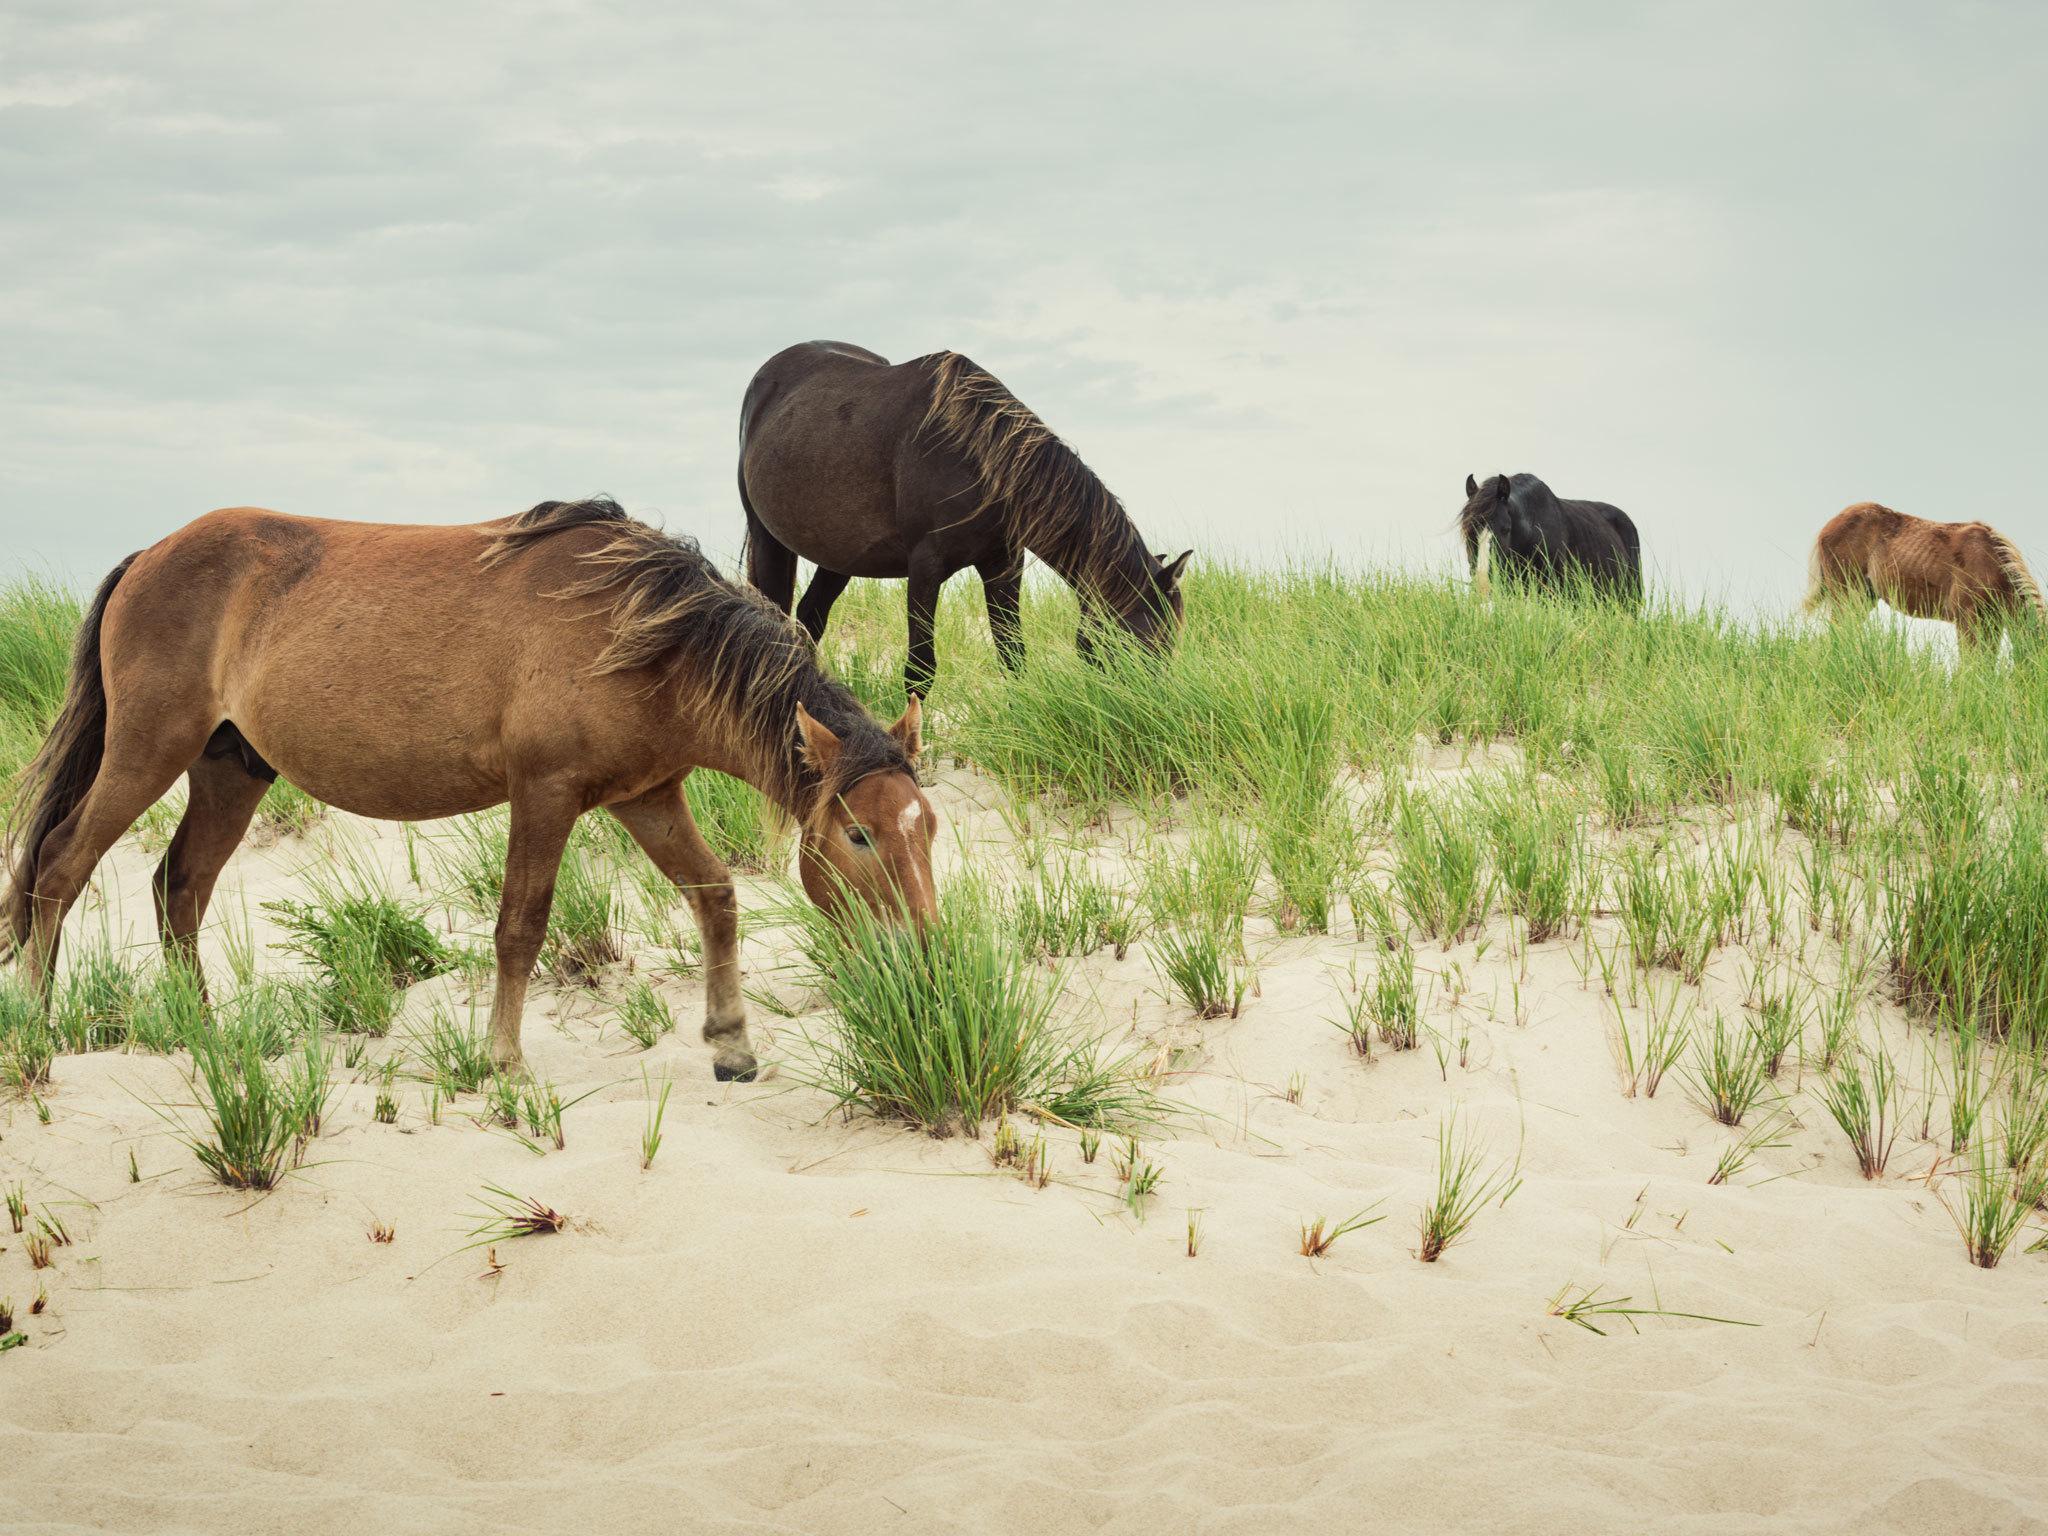 Sable Island horses - Canada